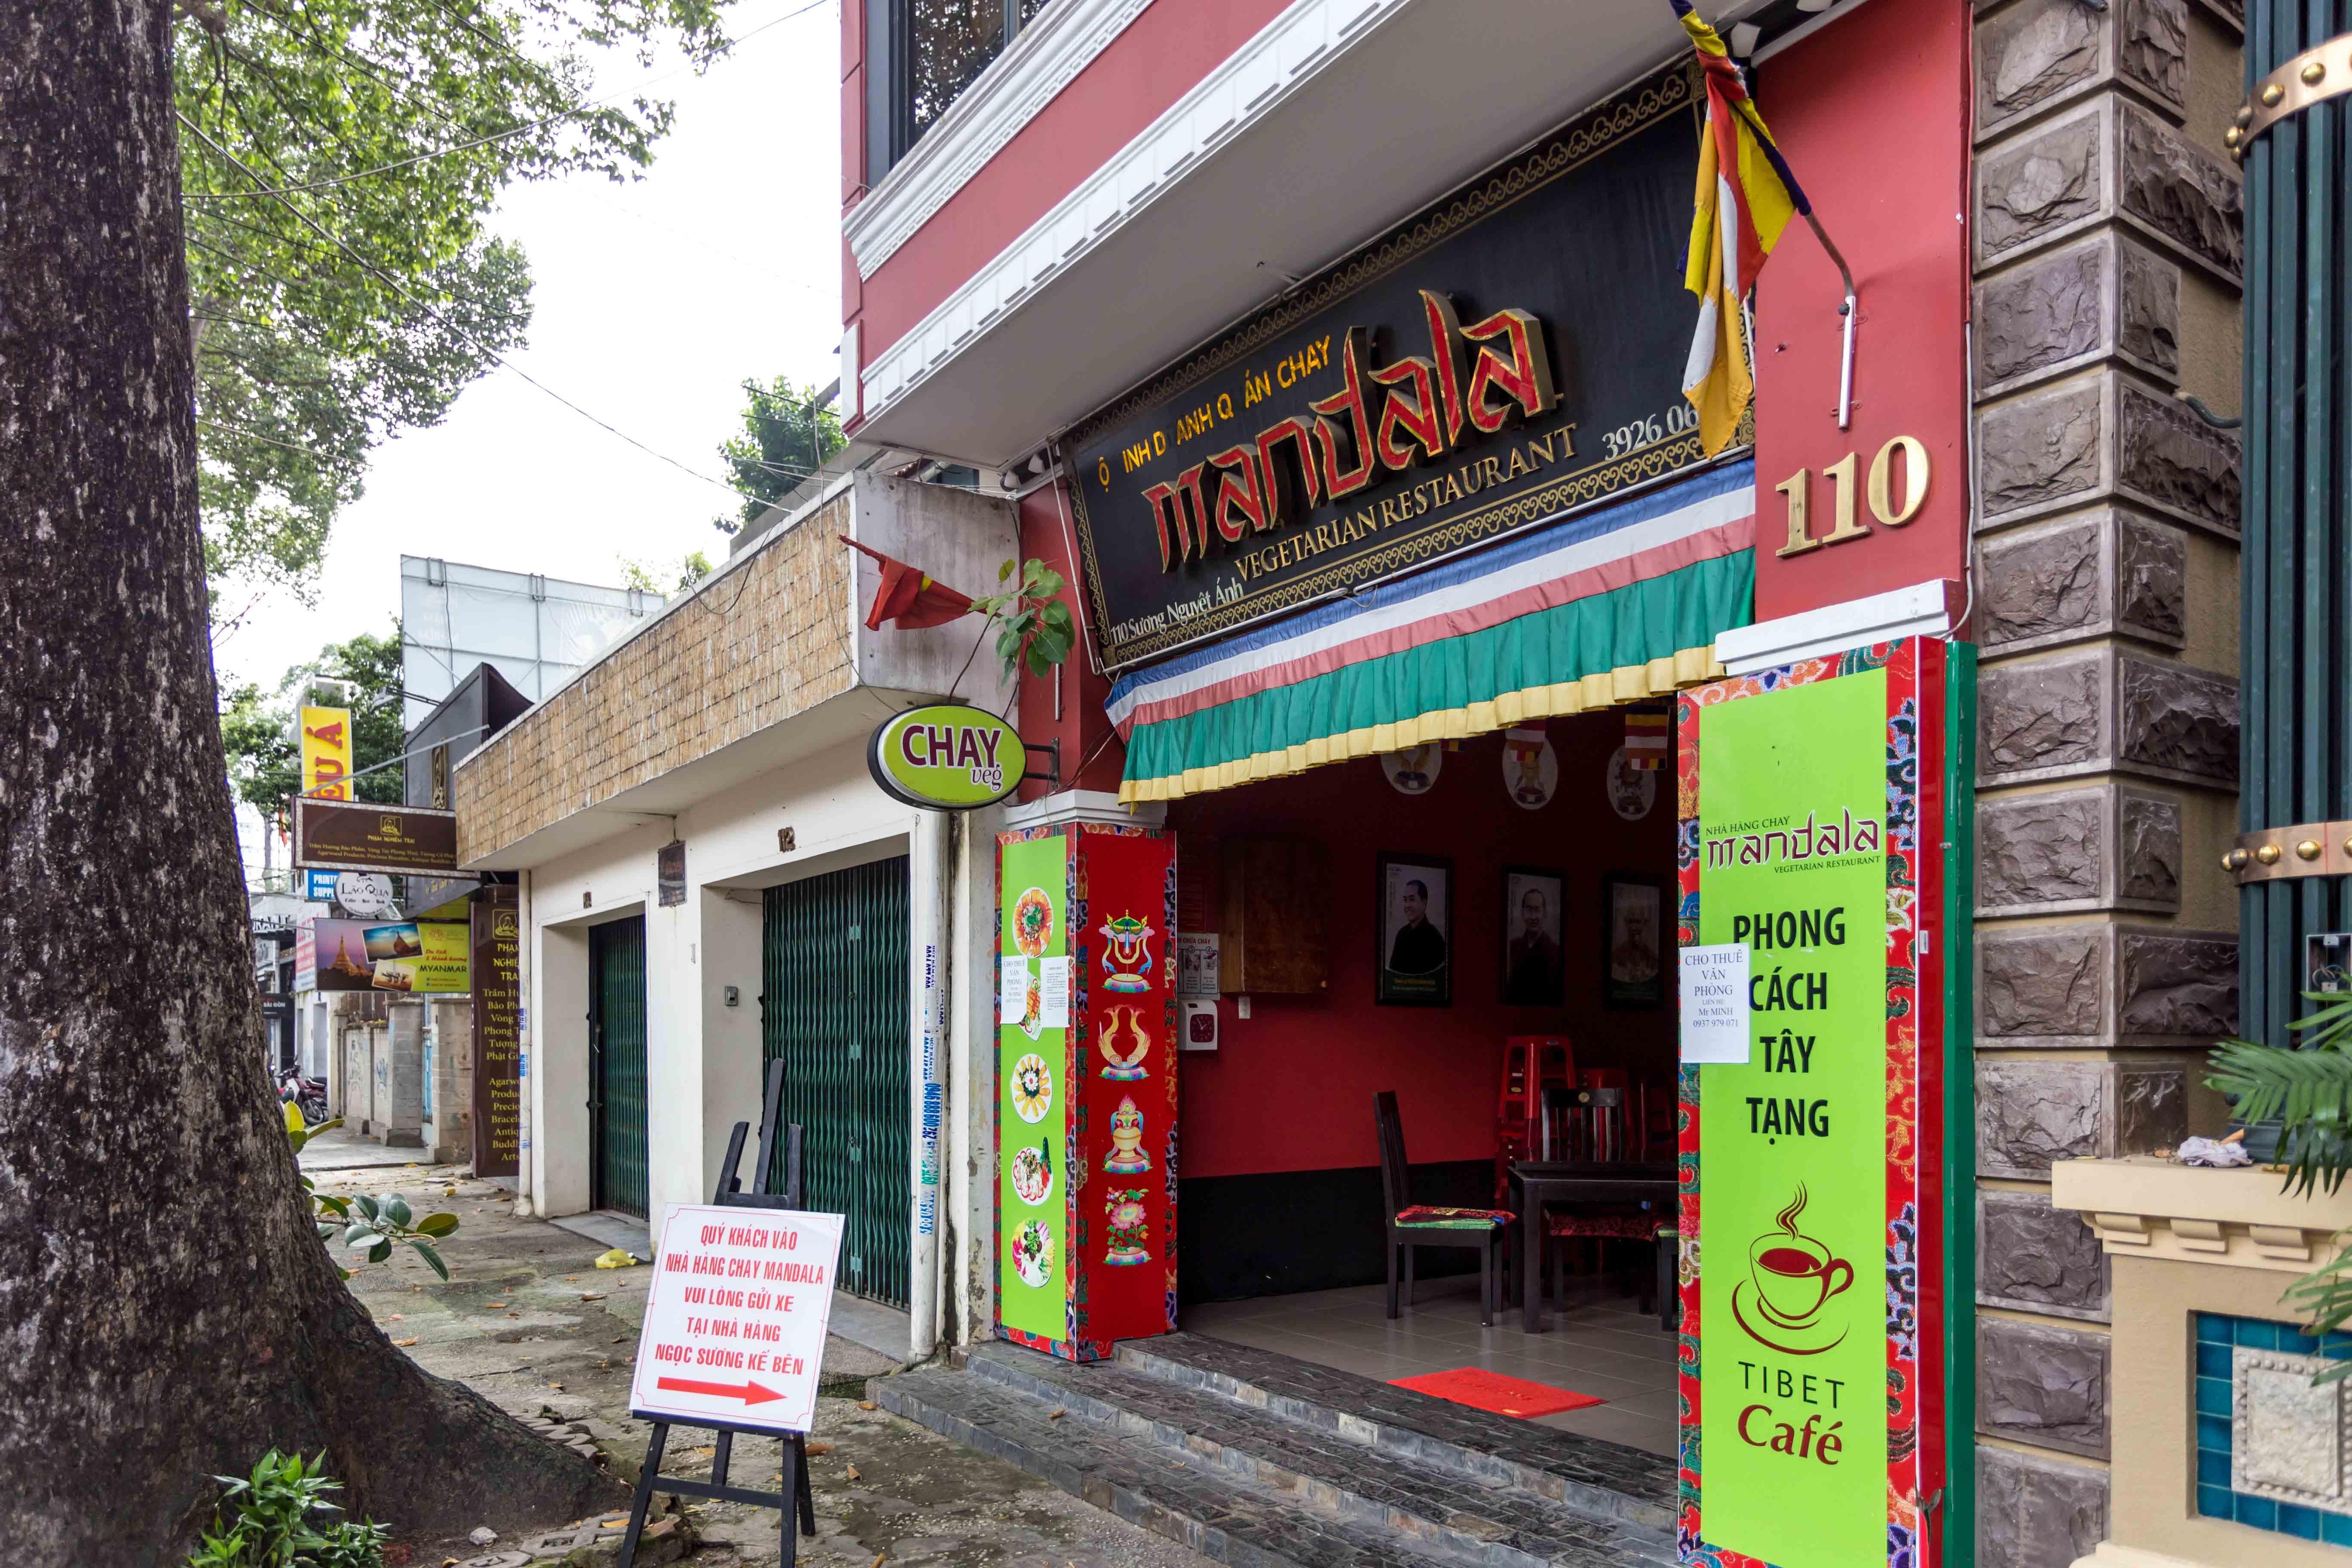 where to eat vegetarian food near me ho chi minh city